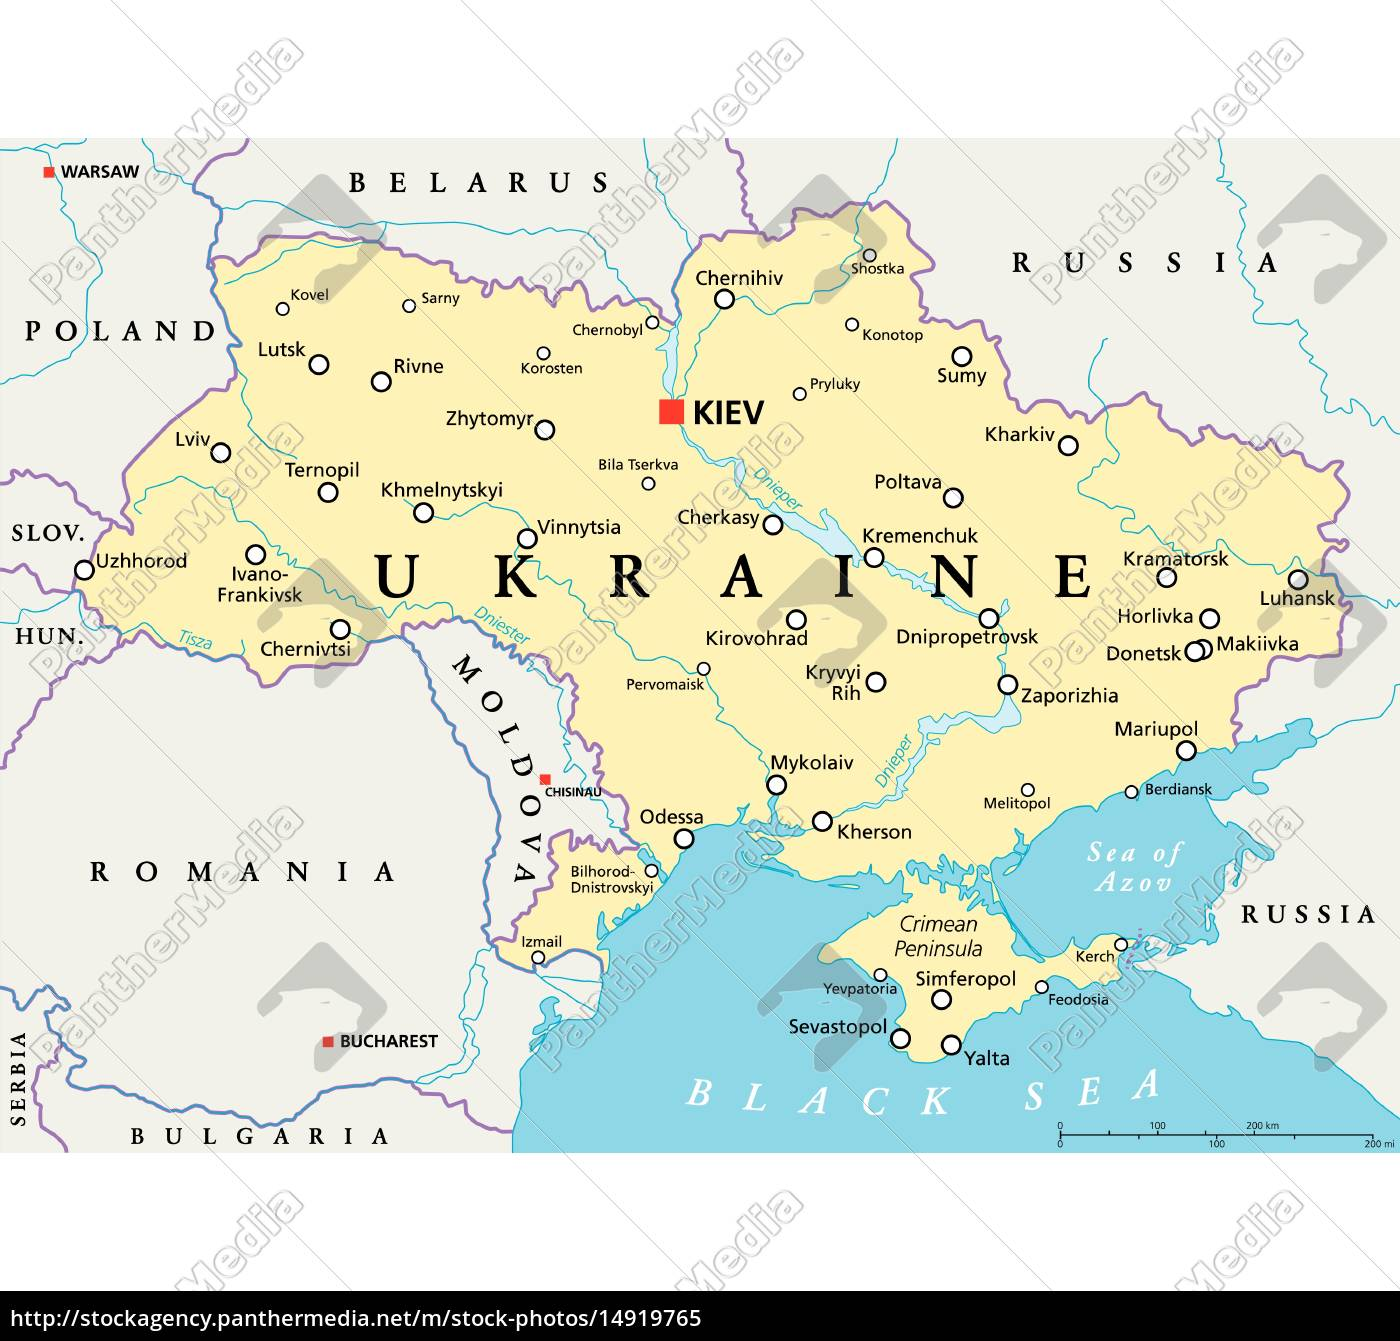 ukraine karte ukraine politische karte   Stockfoto   #14919765   Bildagentur